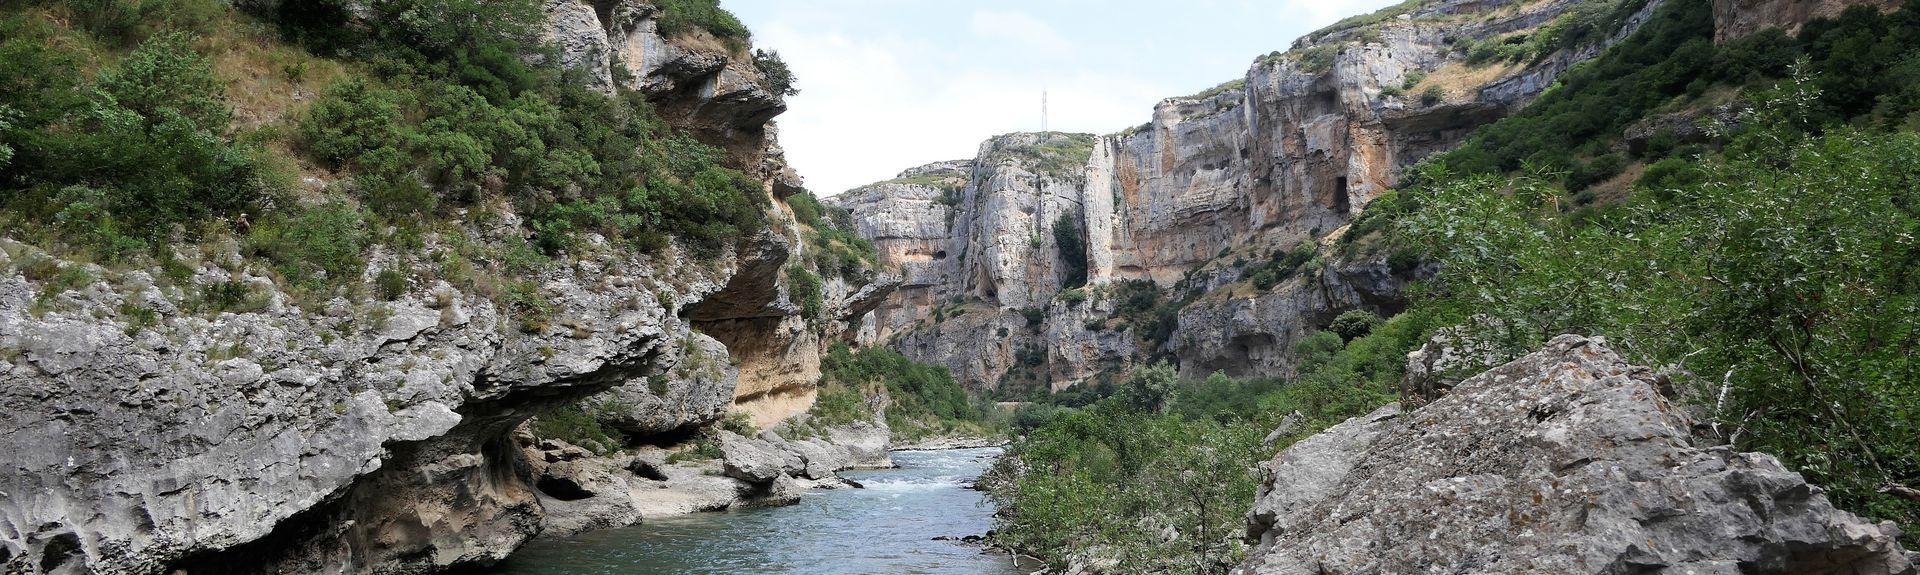 Urraúl Bajo, Navarra, Spanien